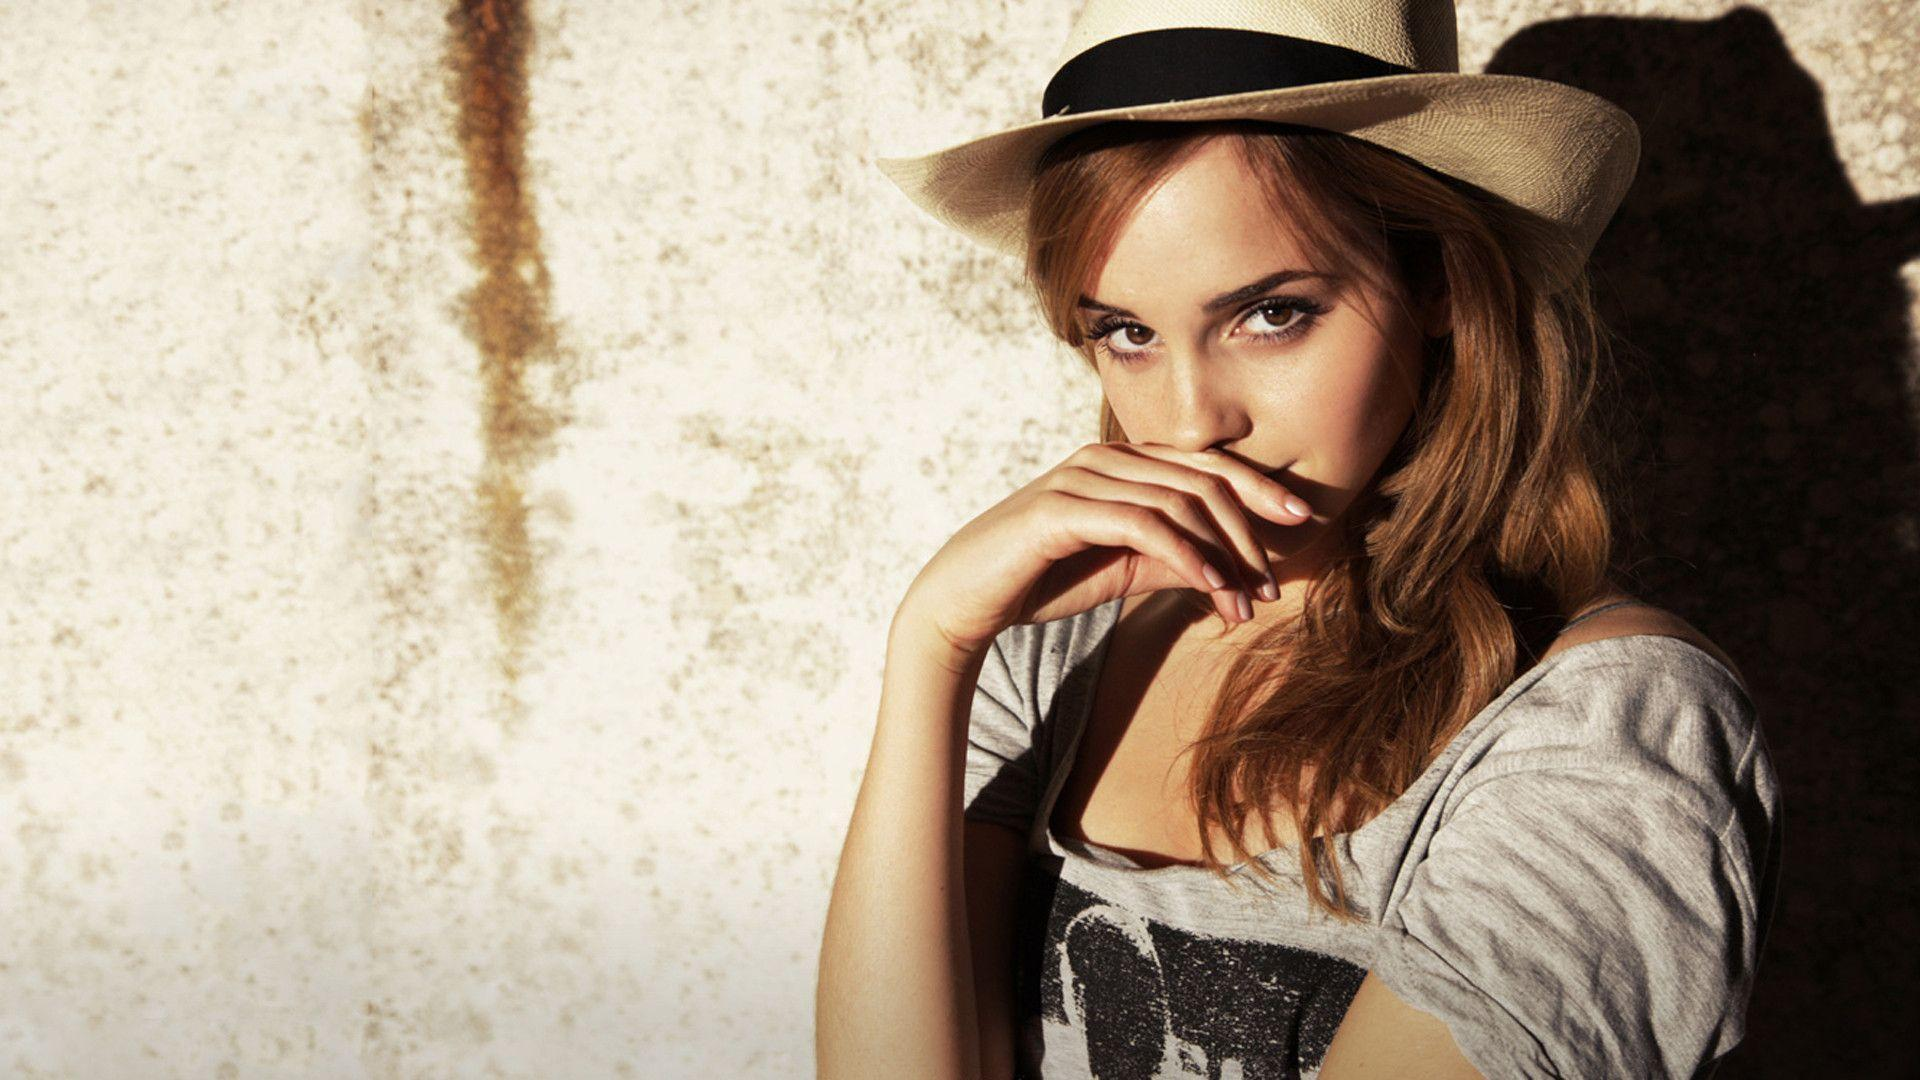 Emma Watson Wallpaper | High Definition Wallpapers